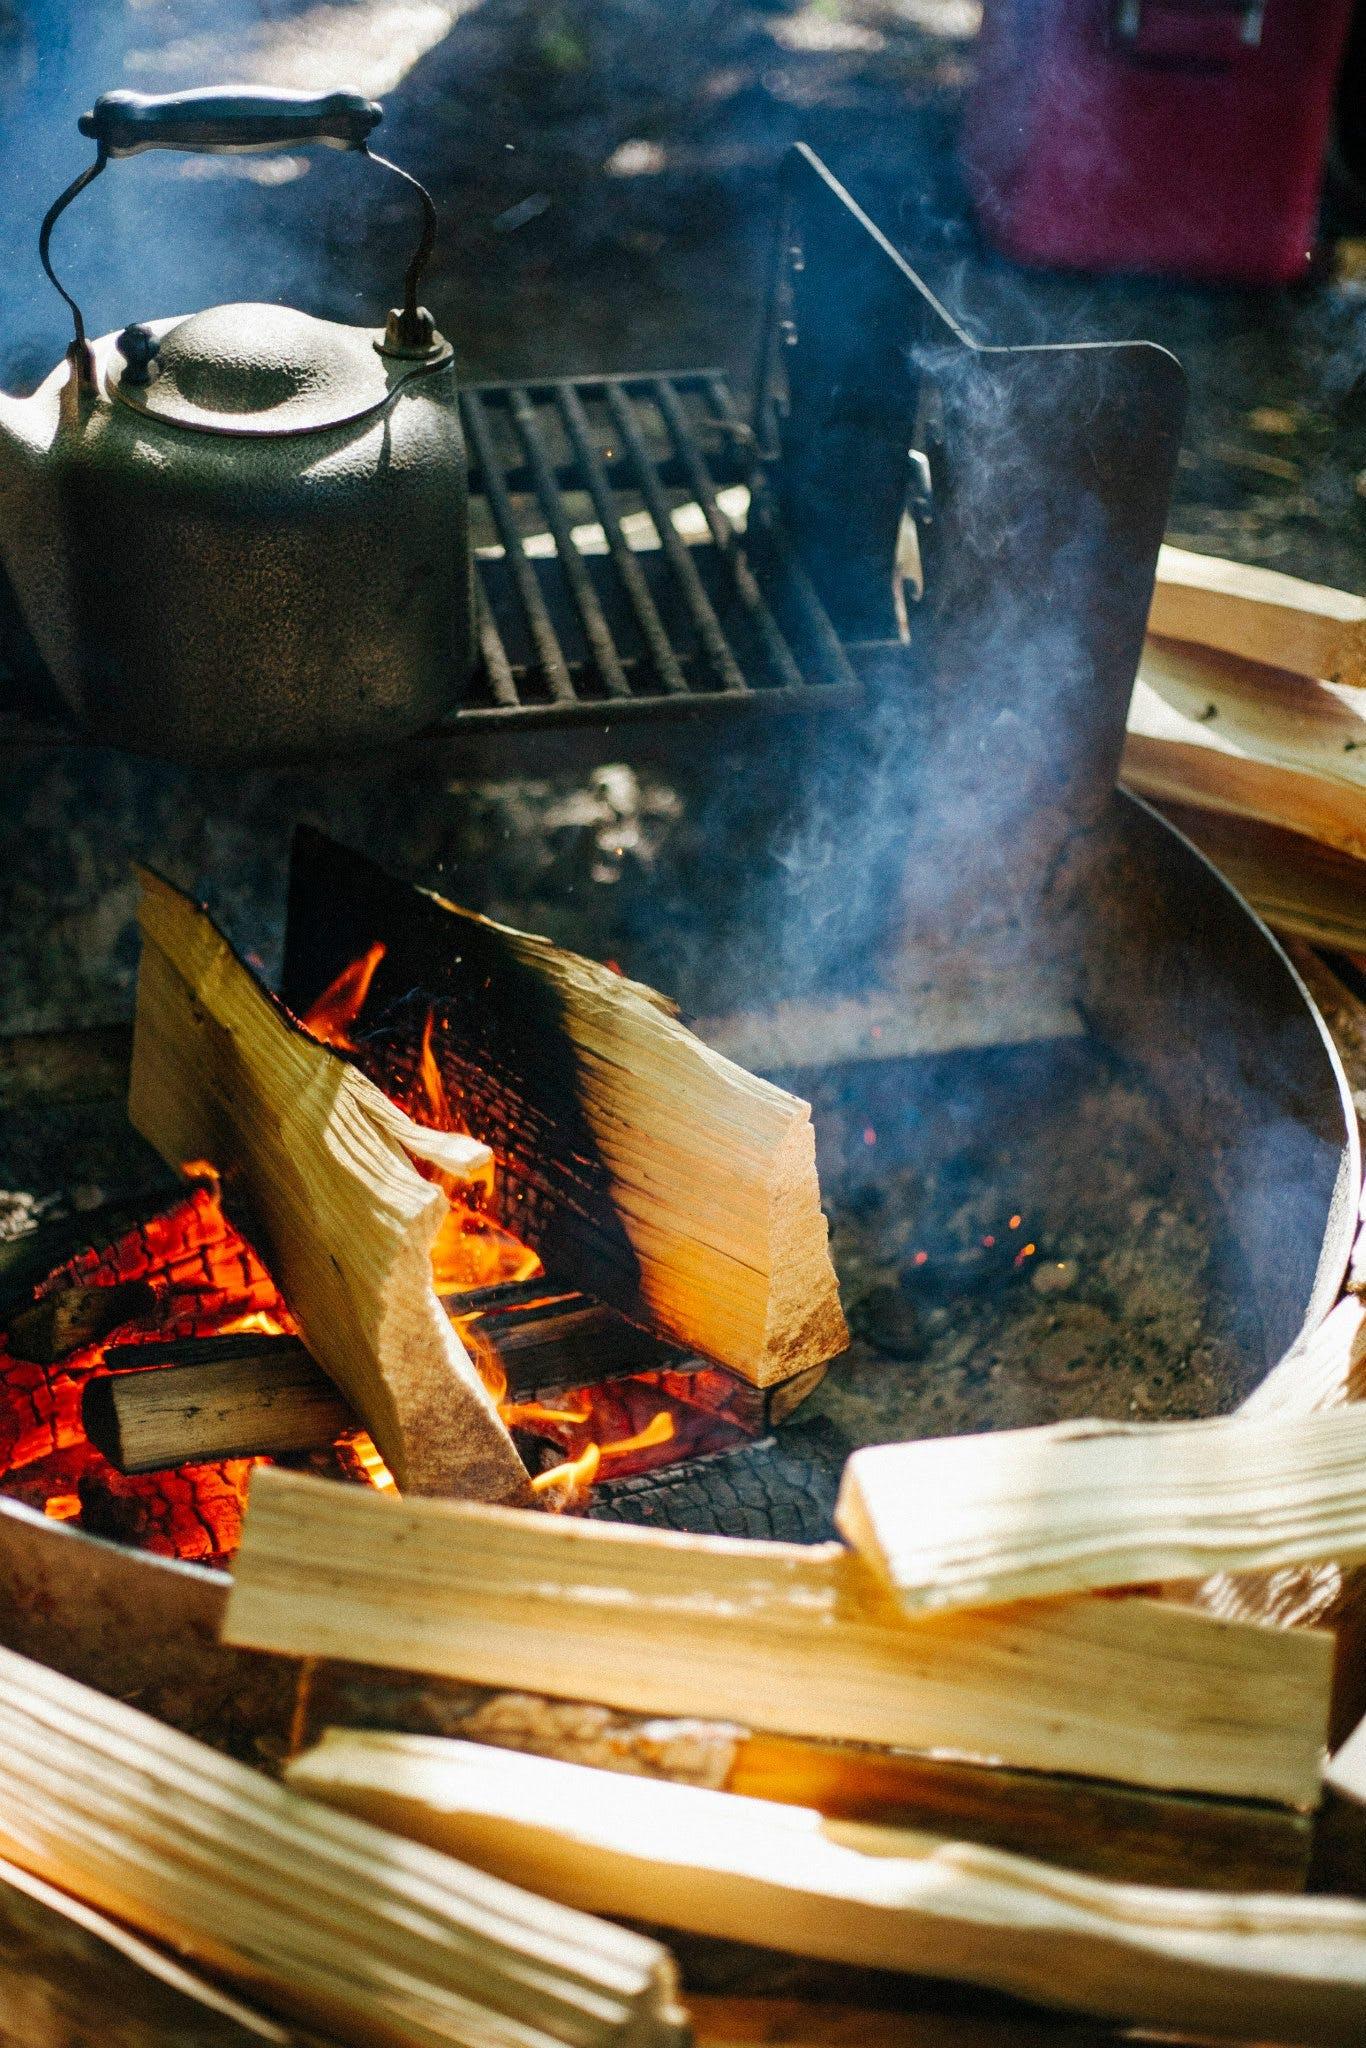 Campfire Cook - Jordan Butcher